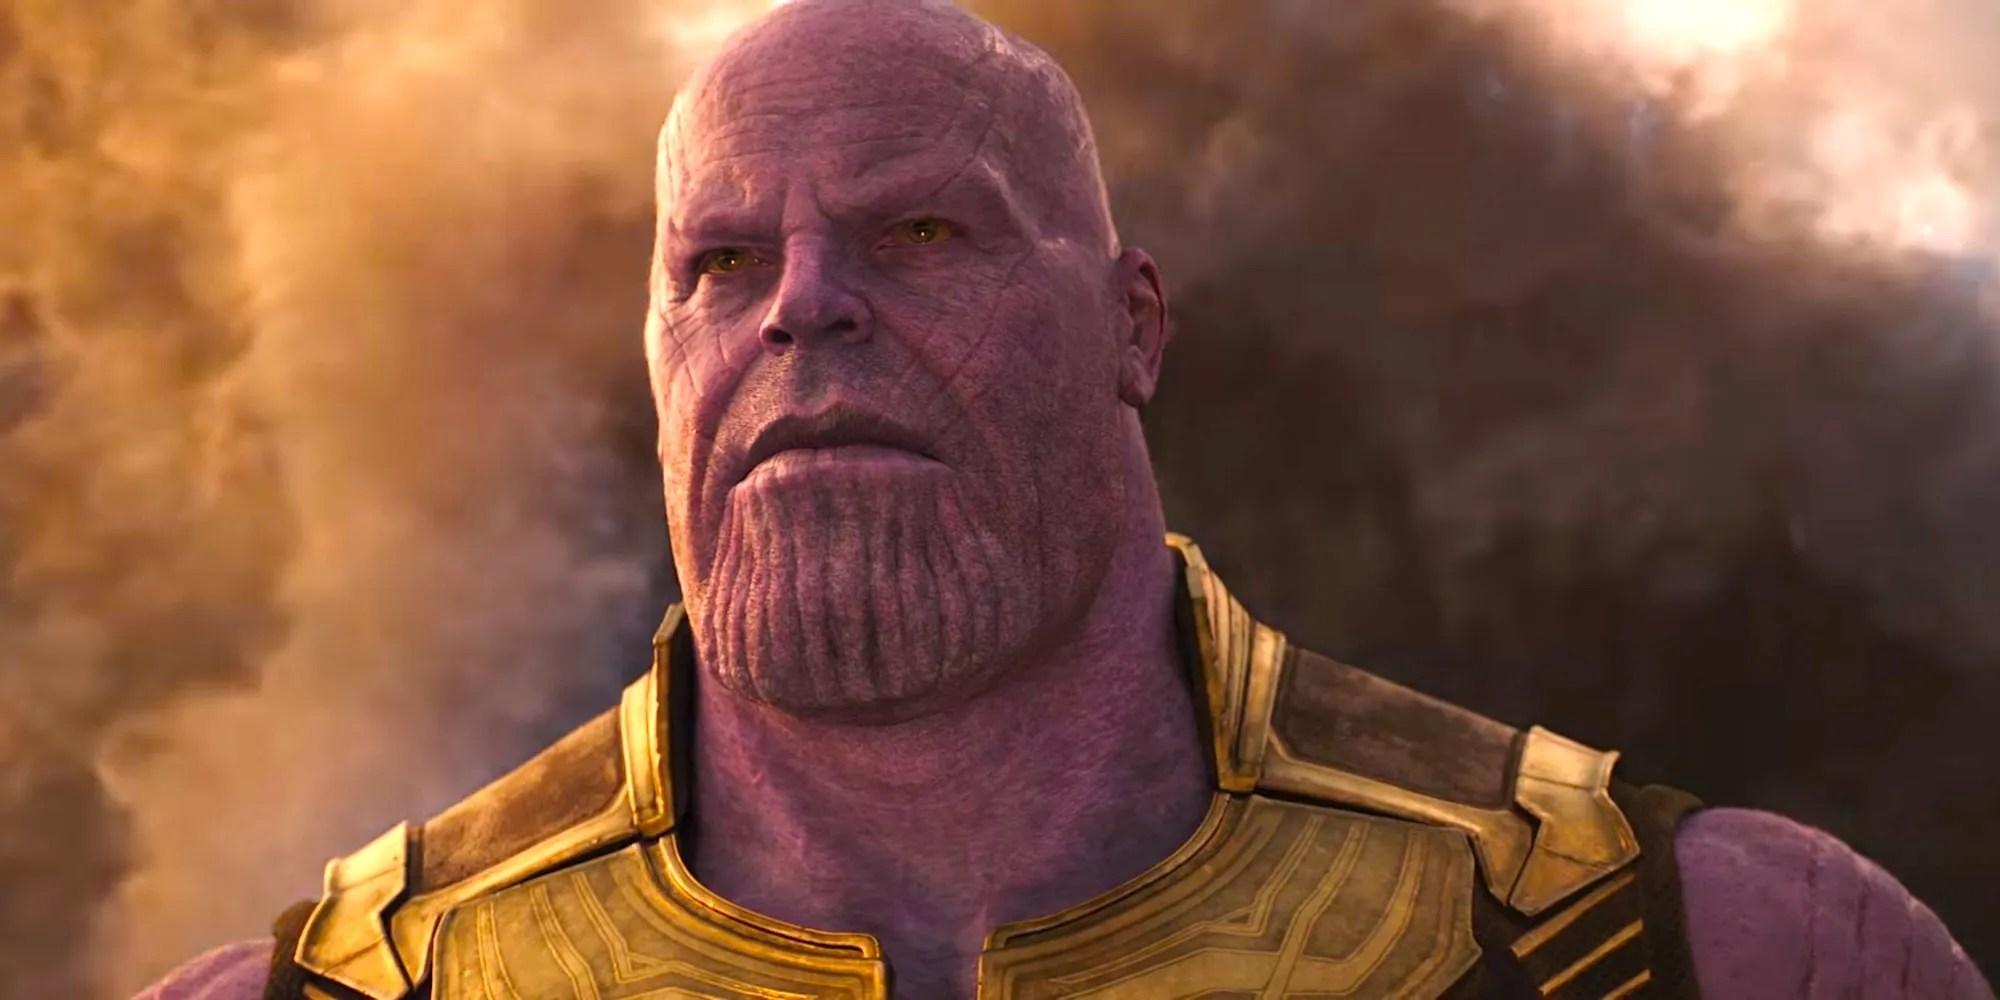 Avengers Endgame Magazine Cover Reveals Best Look At Thanos Farm